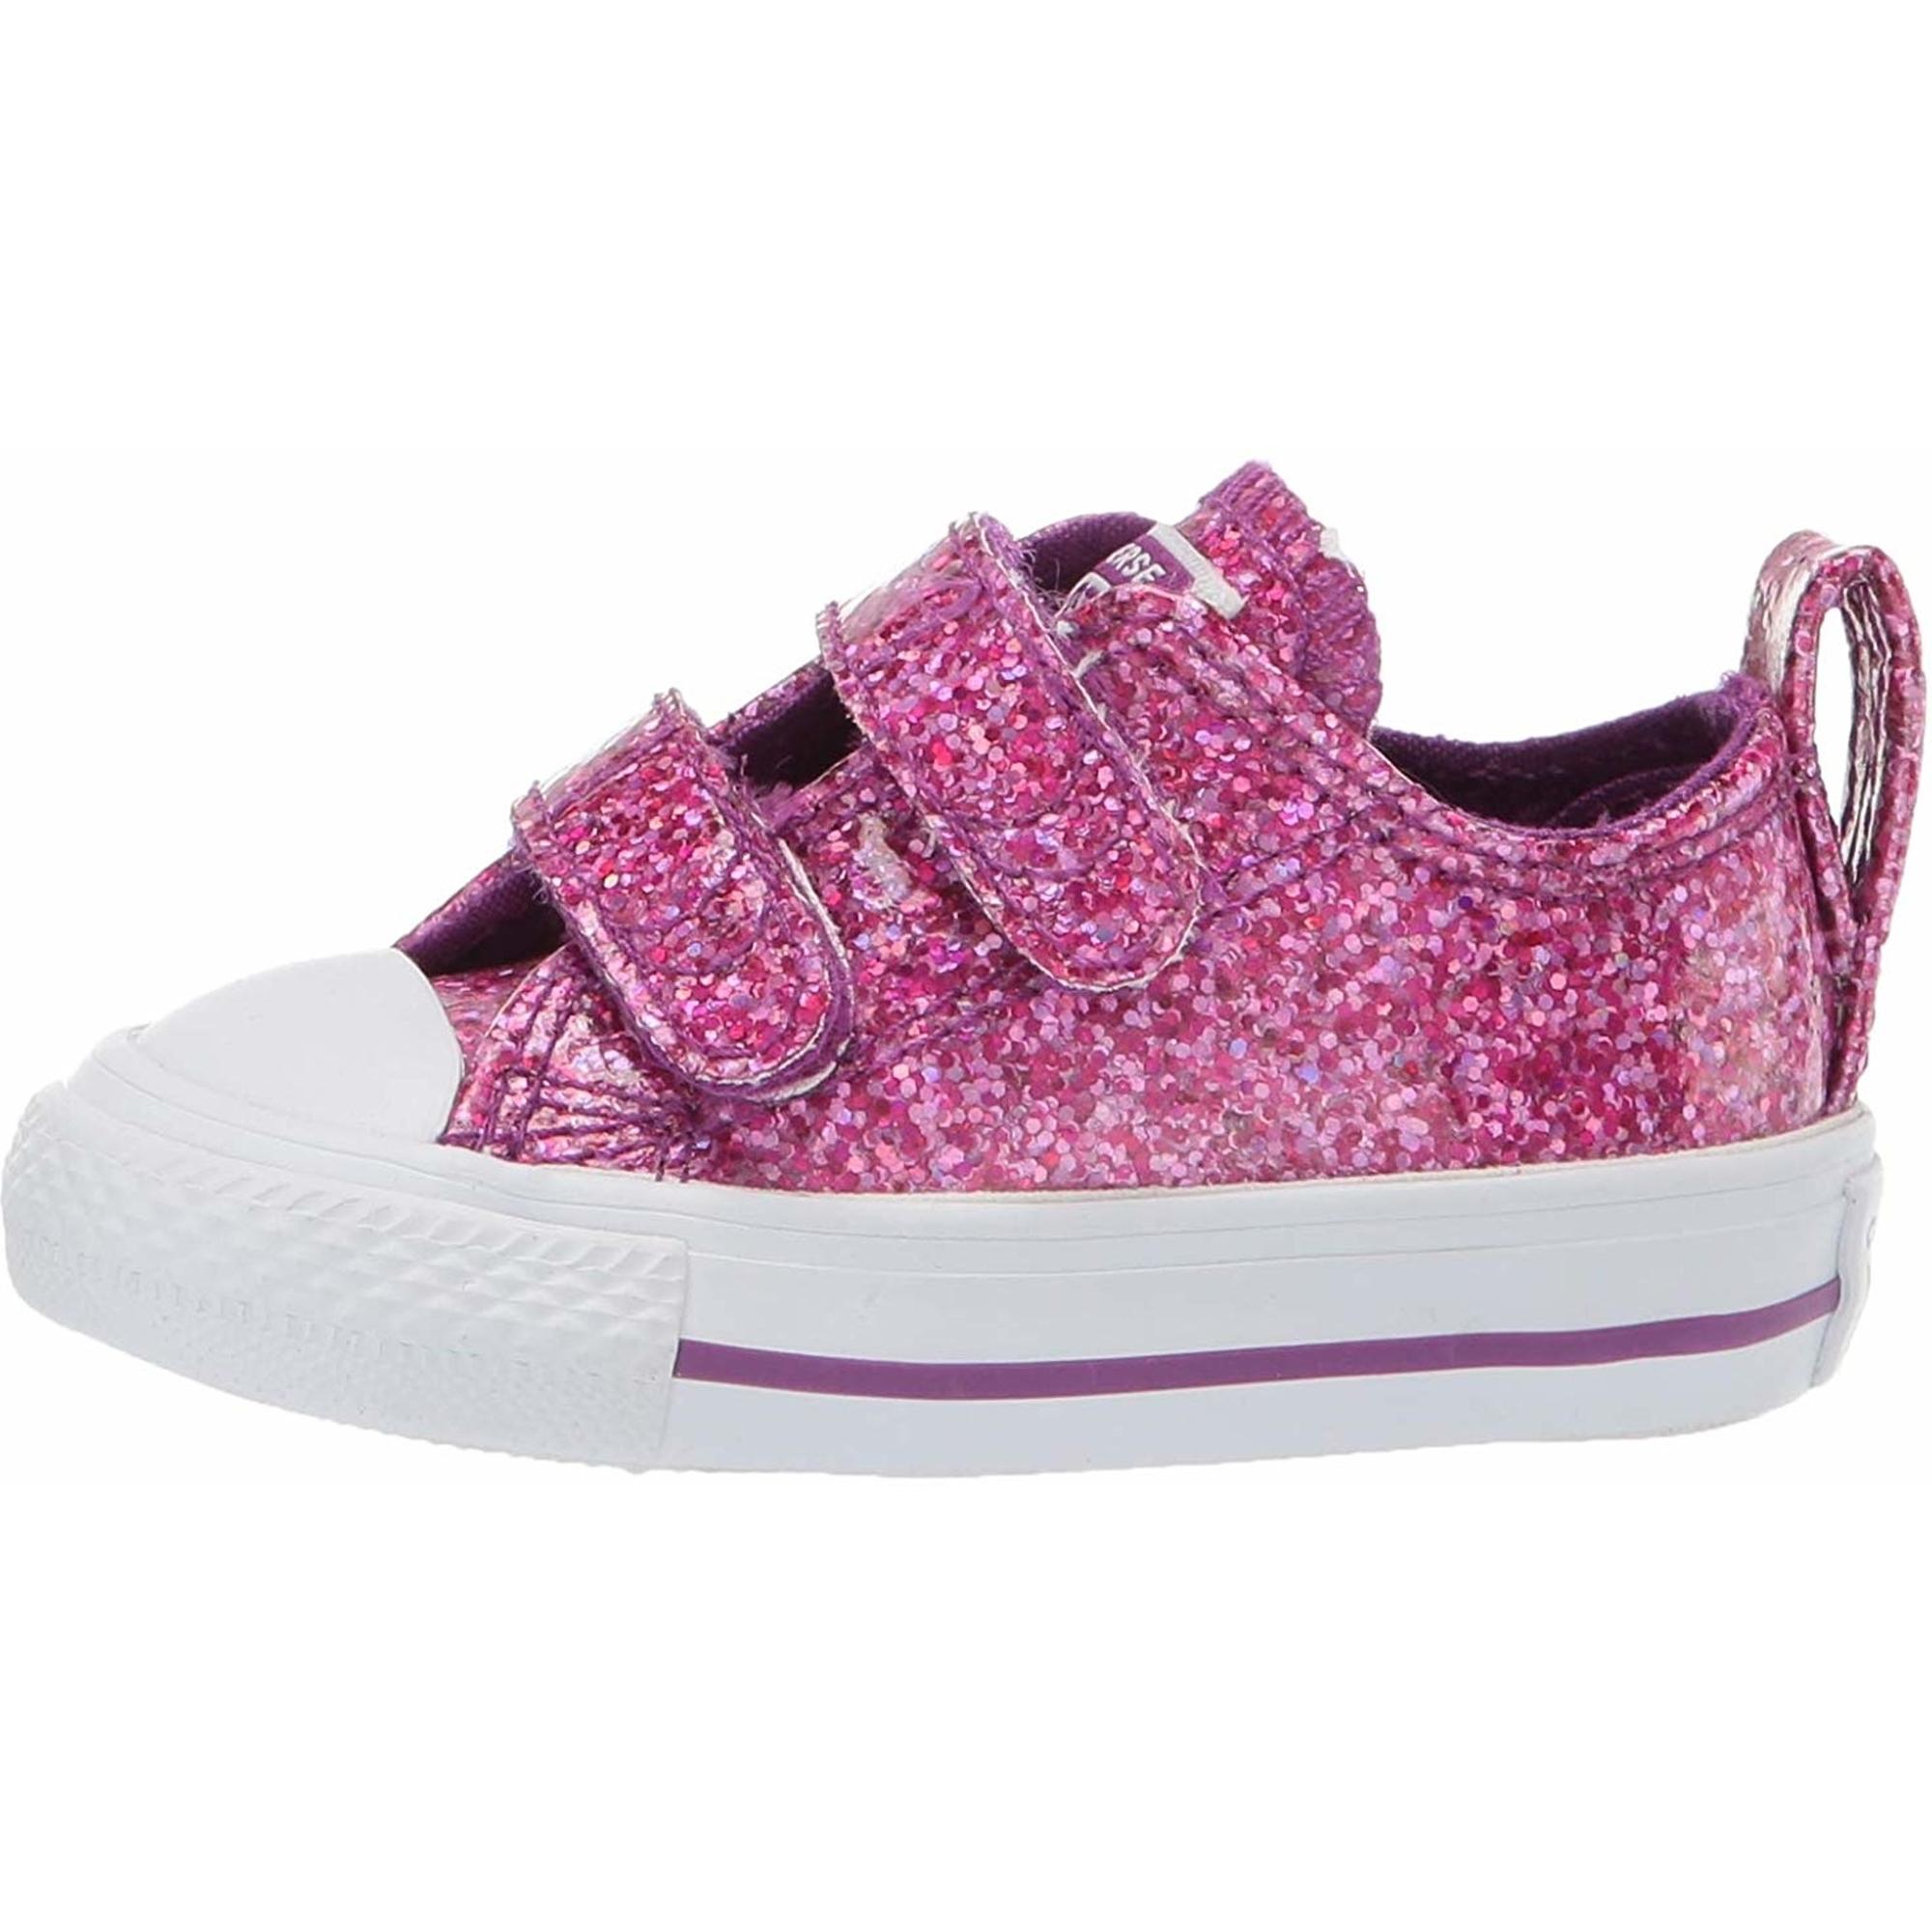 Converse Chuck Taylor All Star 2V Party Dress Ox Ikone Violett Synthetik Baby